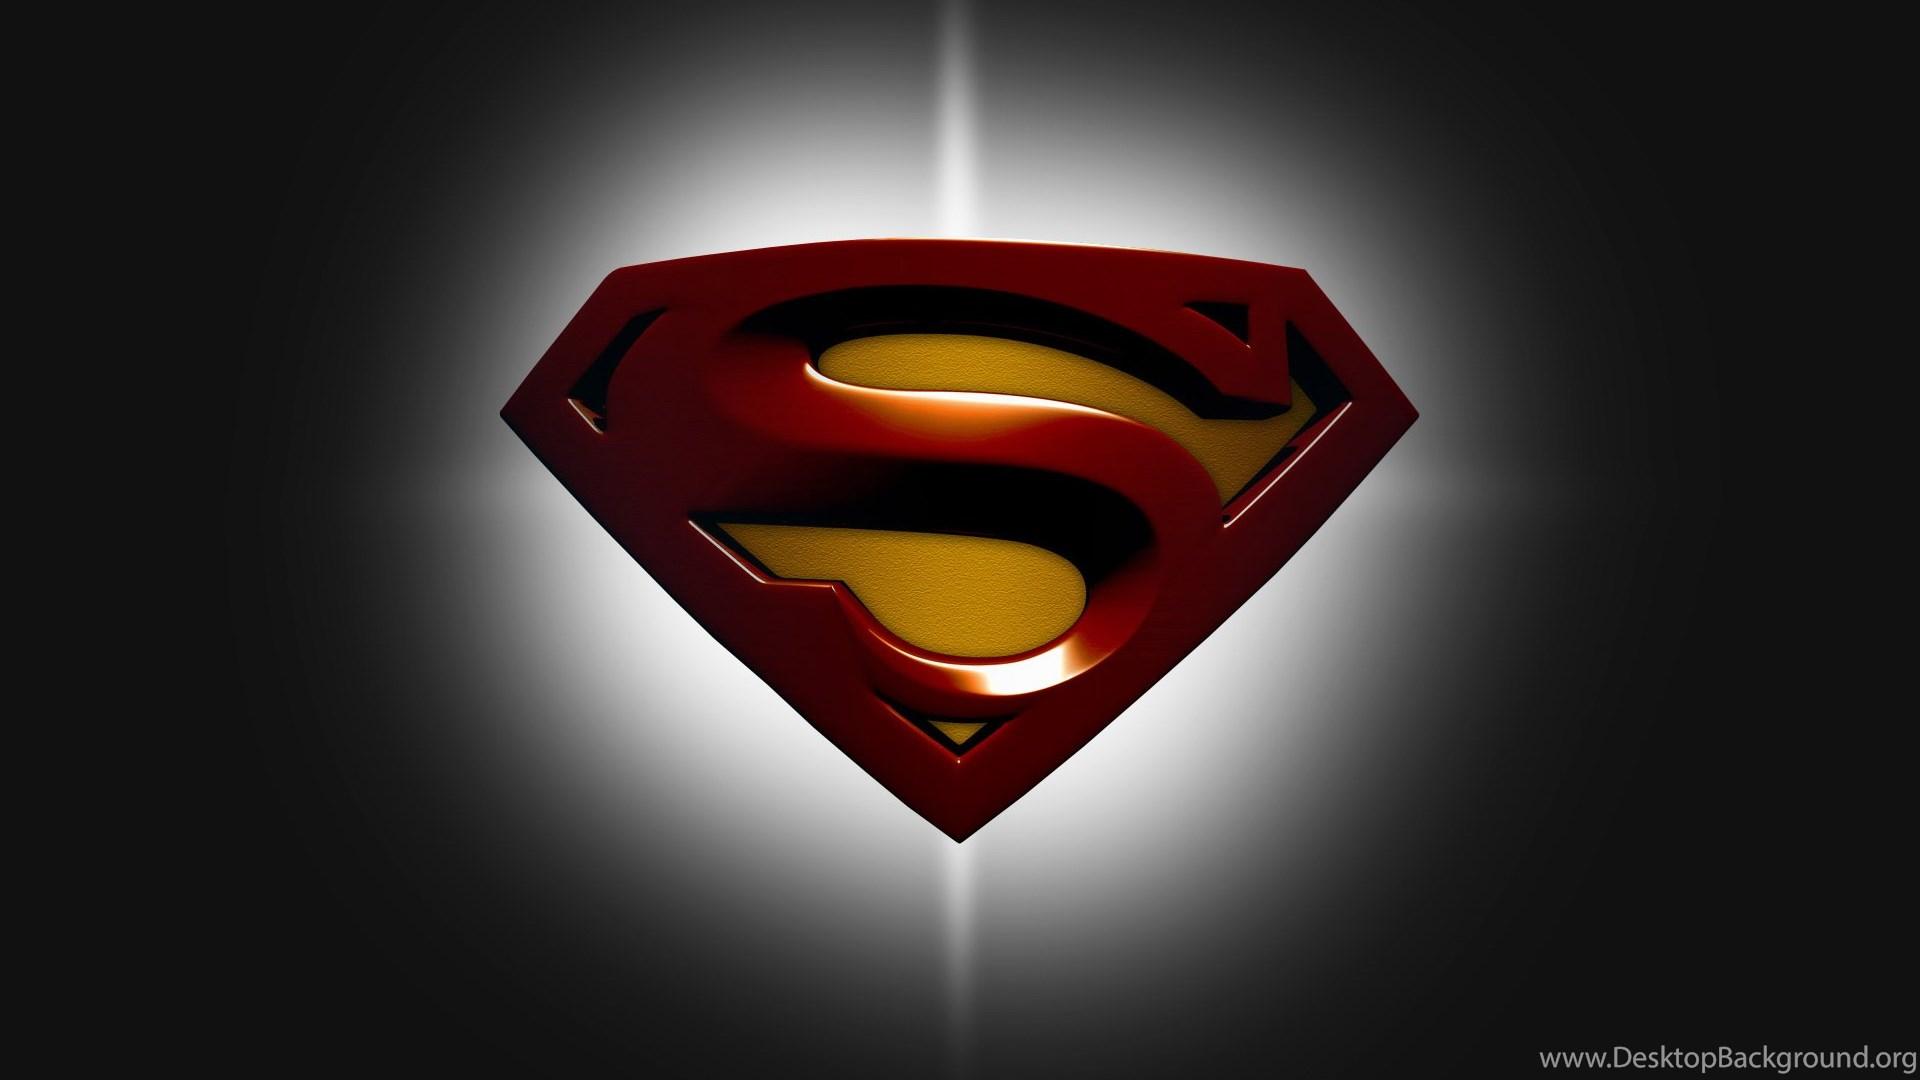 Download superman logo wallpapers 1080p desktop background popular voltagebd Choice Image